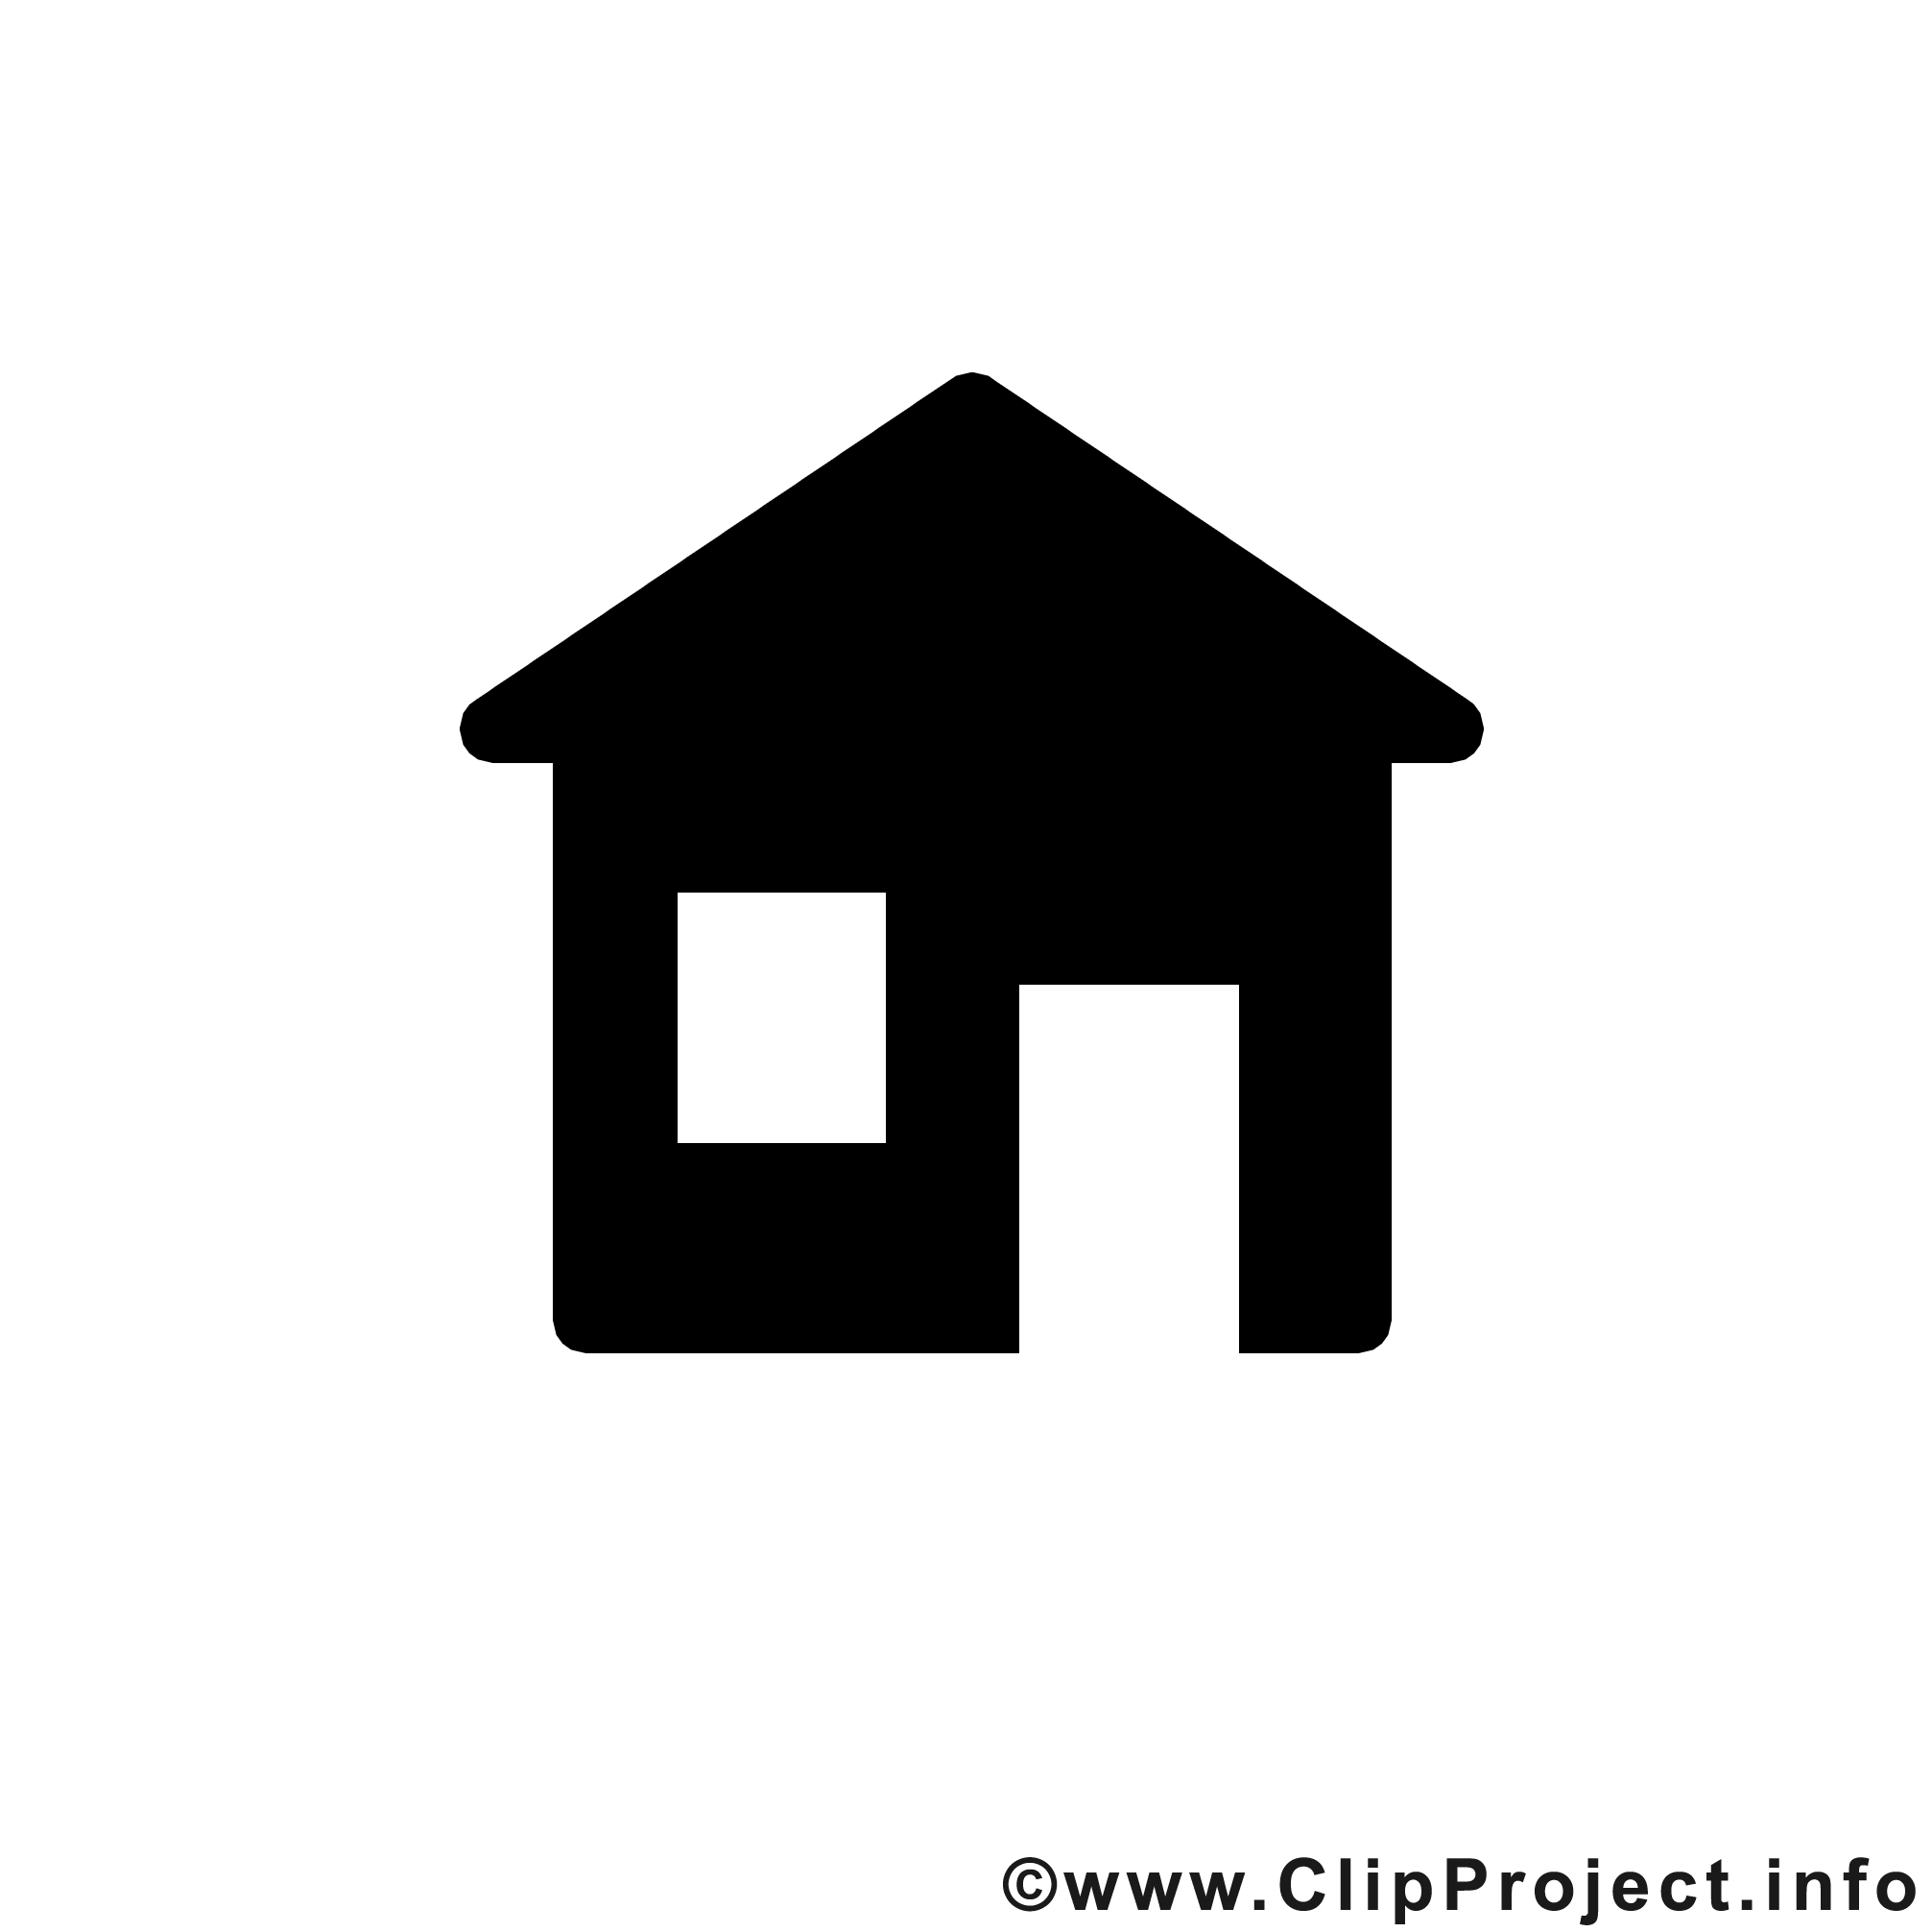 Haus clipart schwarz wei image black and white stock Haus clipart schwarz weiß - ClipartFest image black and white stock